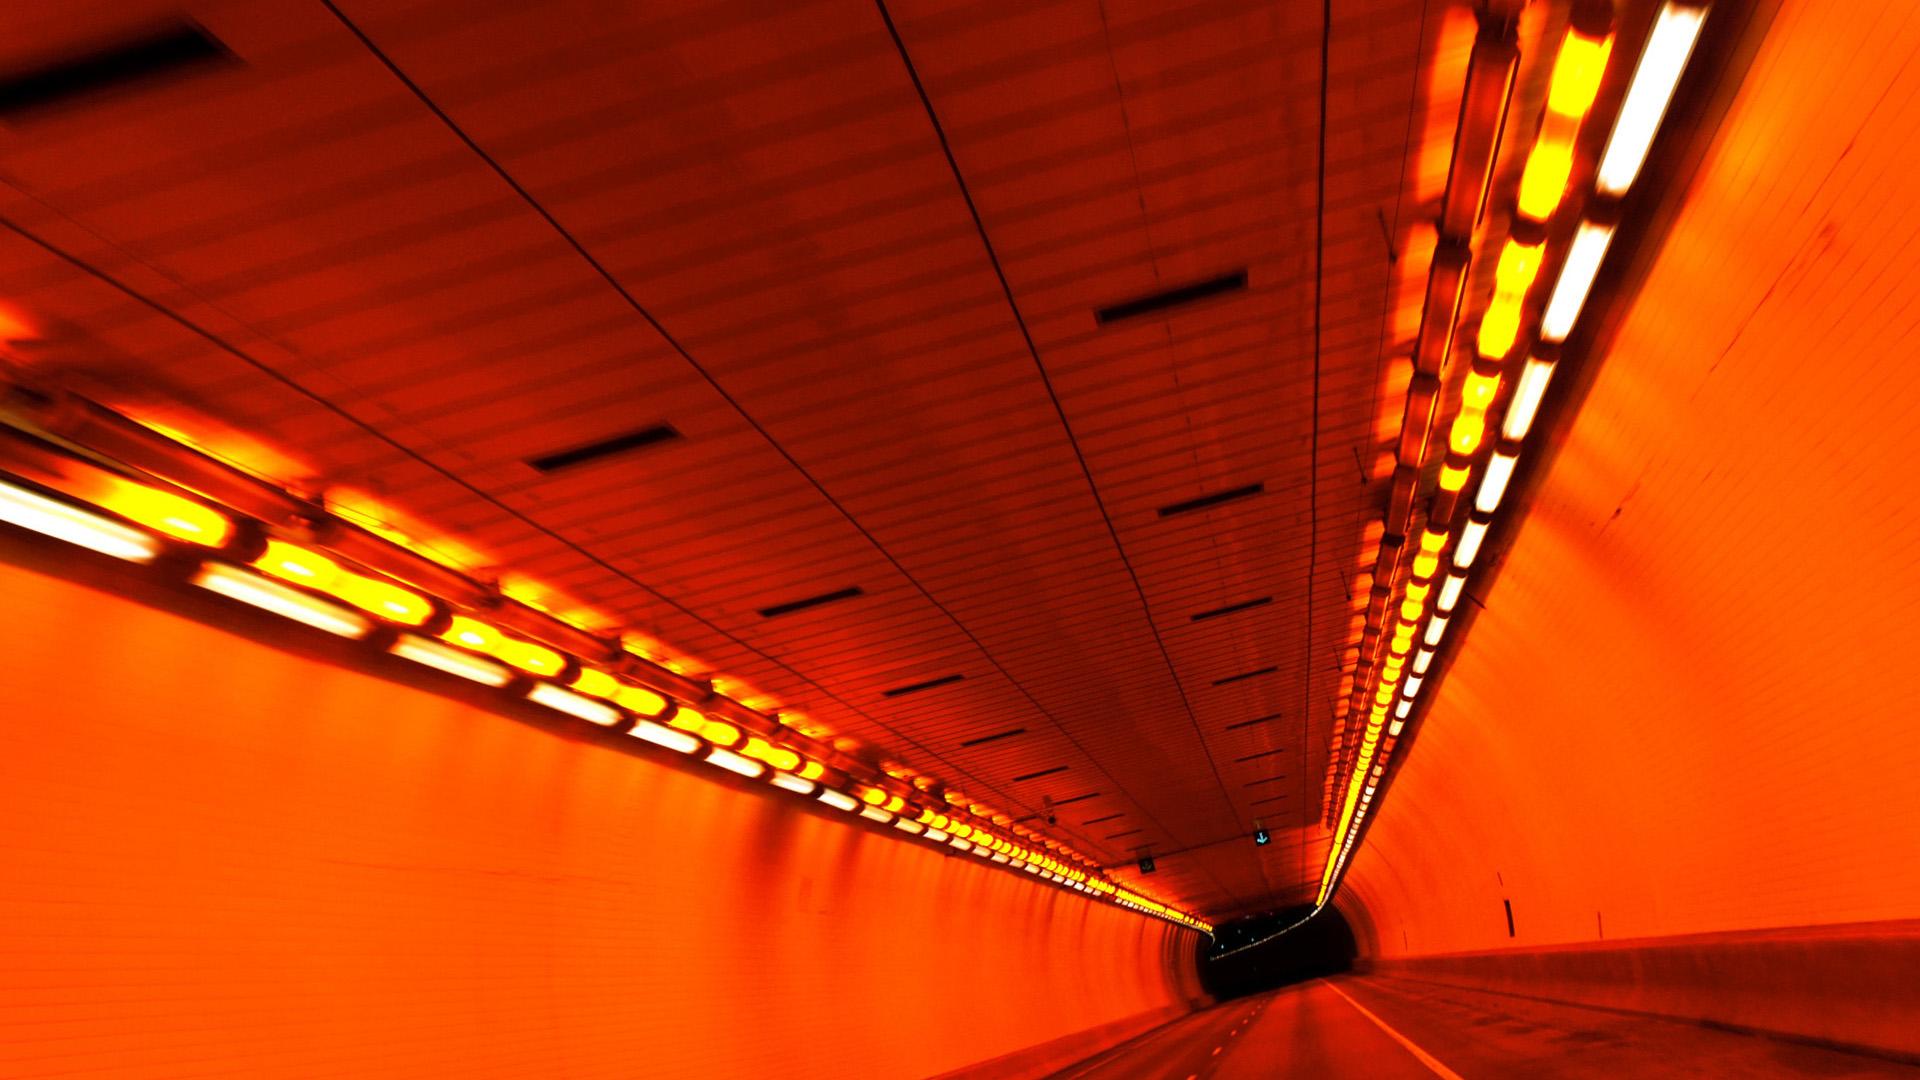 tunnel desktop wallpaper pictures 59762